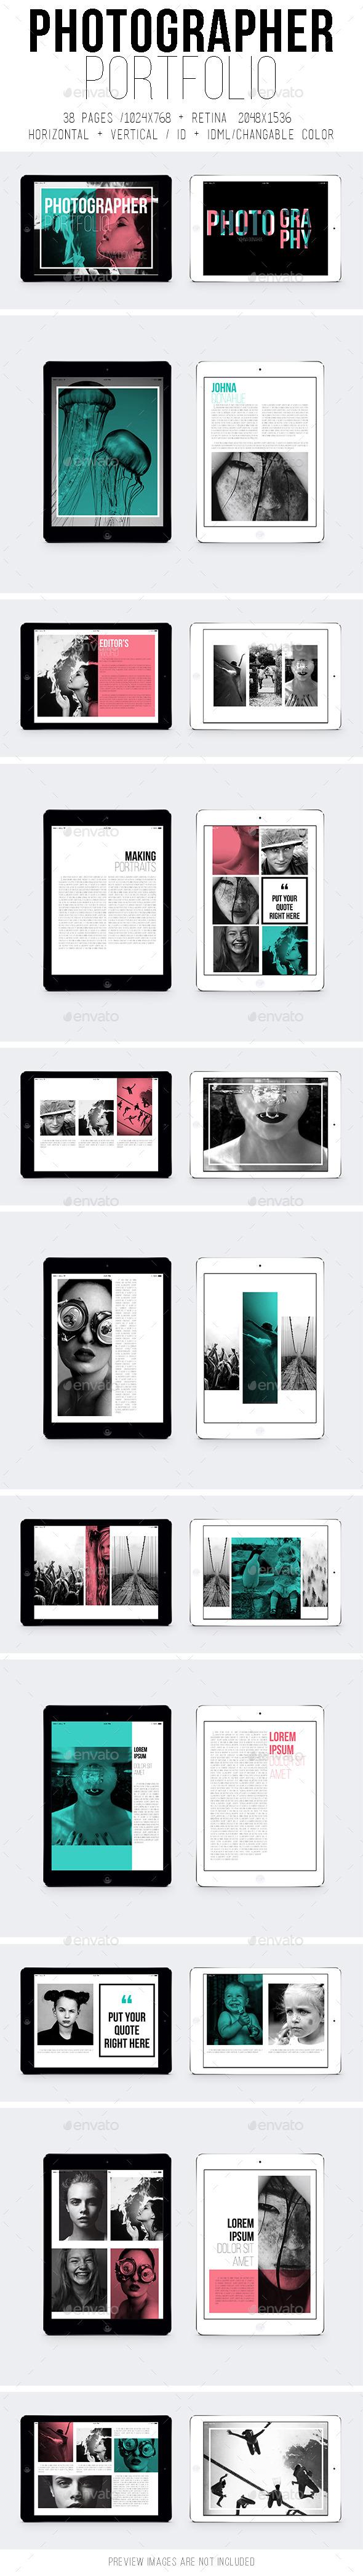 Ipad & Tablet Photographer Portfolio - Digital Magazines ePublishing